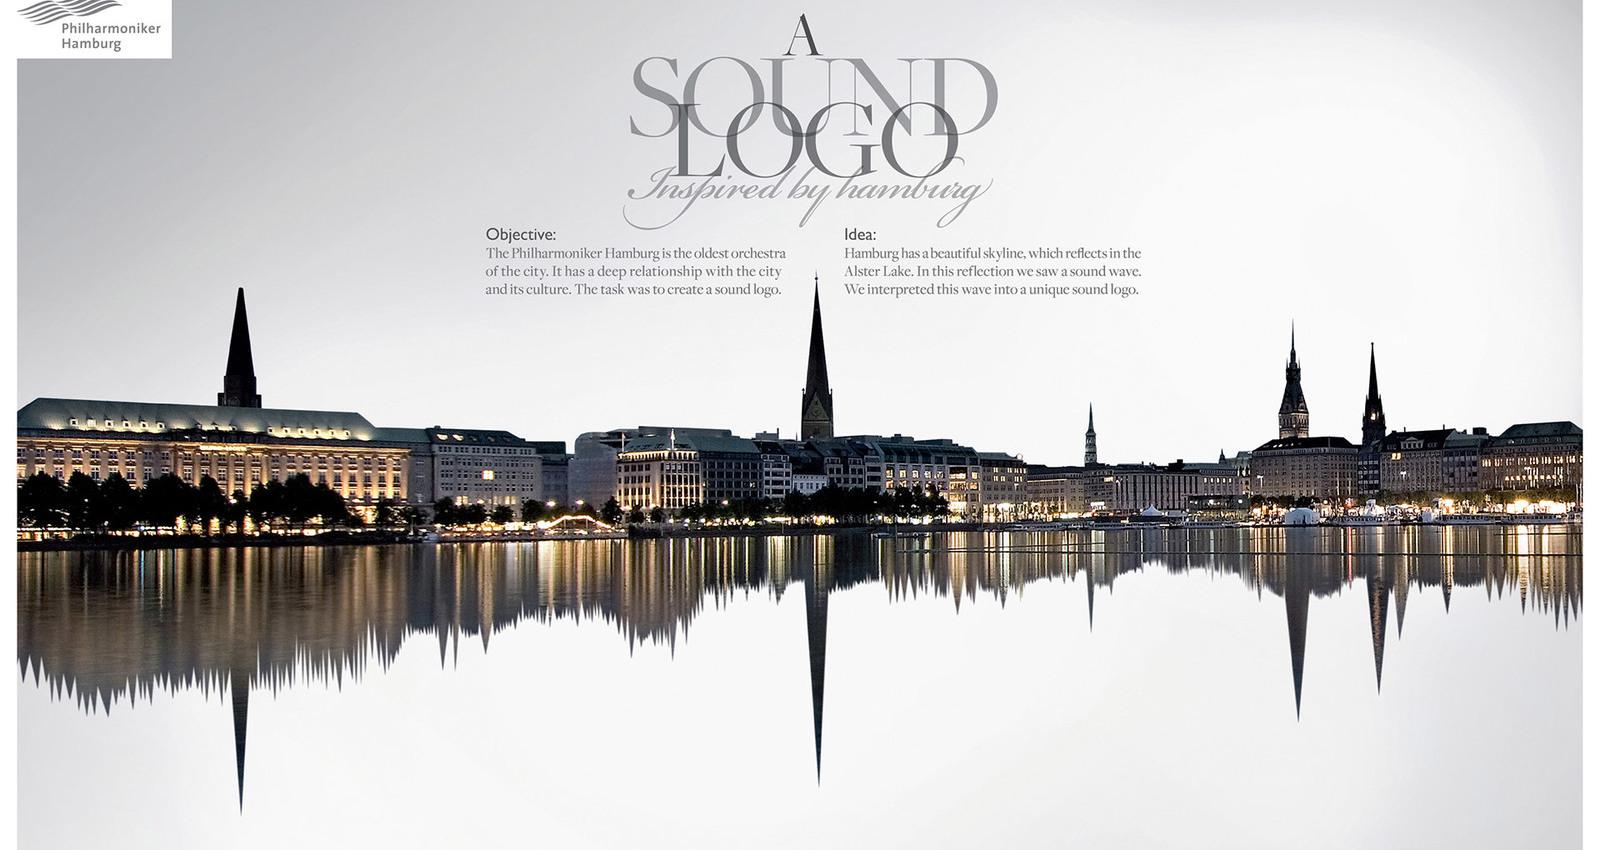 A Sound Logo - Inspired by Hamburg